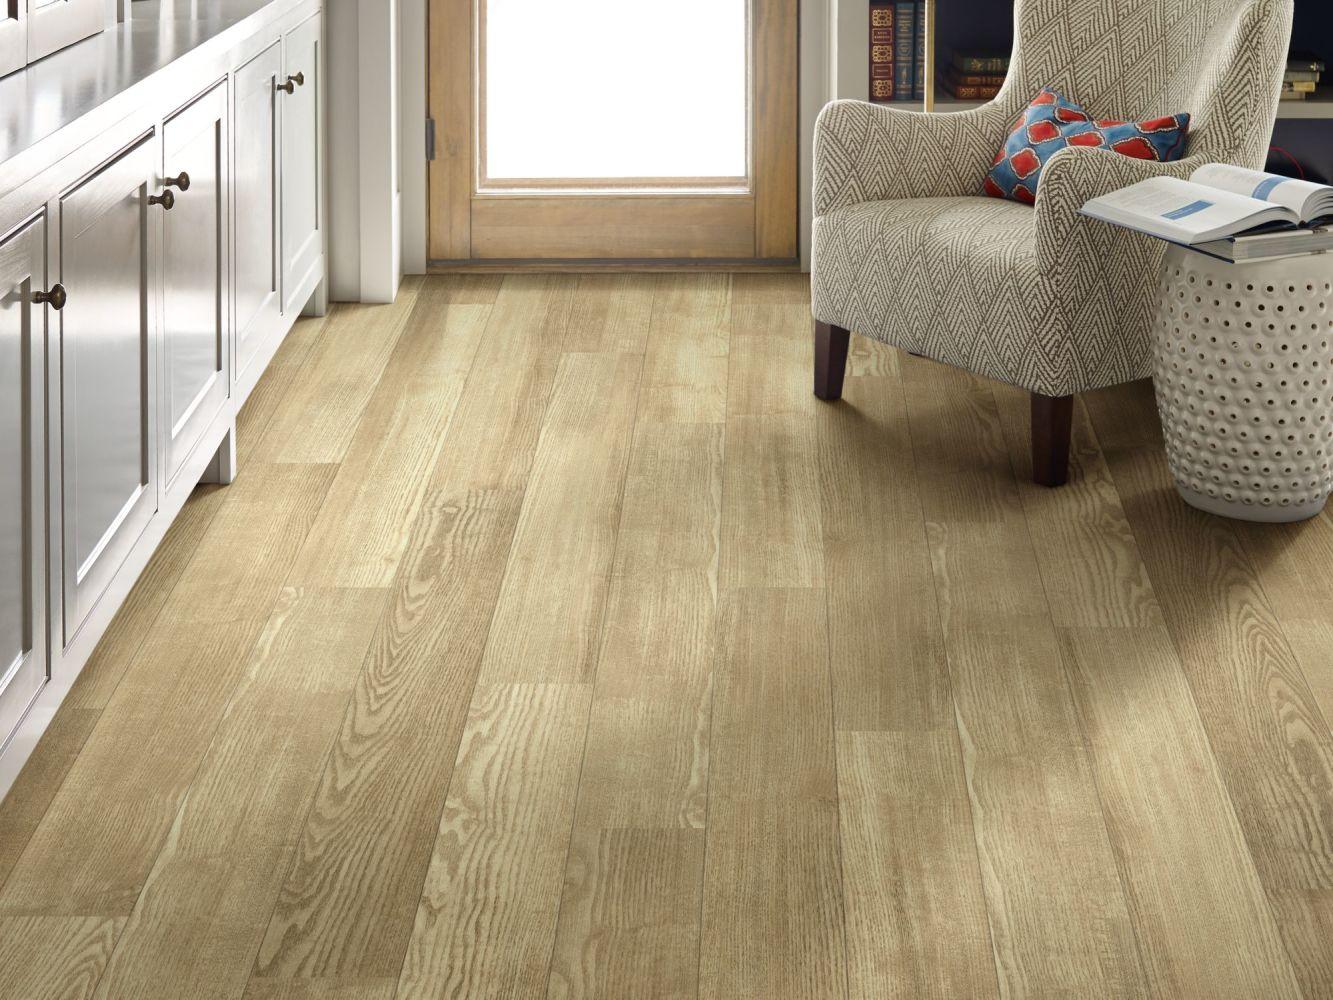 Shaw Floors 5th And Main Symbiotic 30 Sandstone 00173_5M304